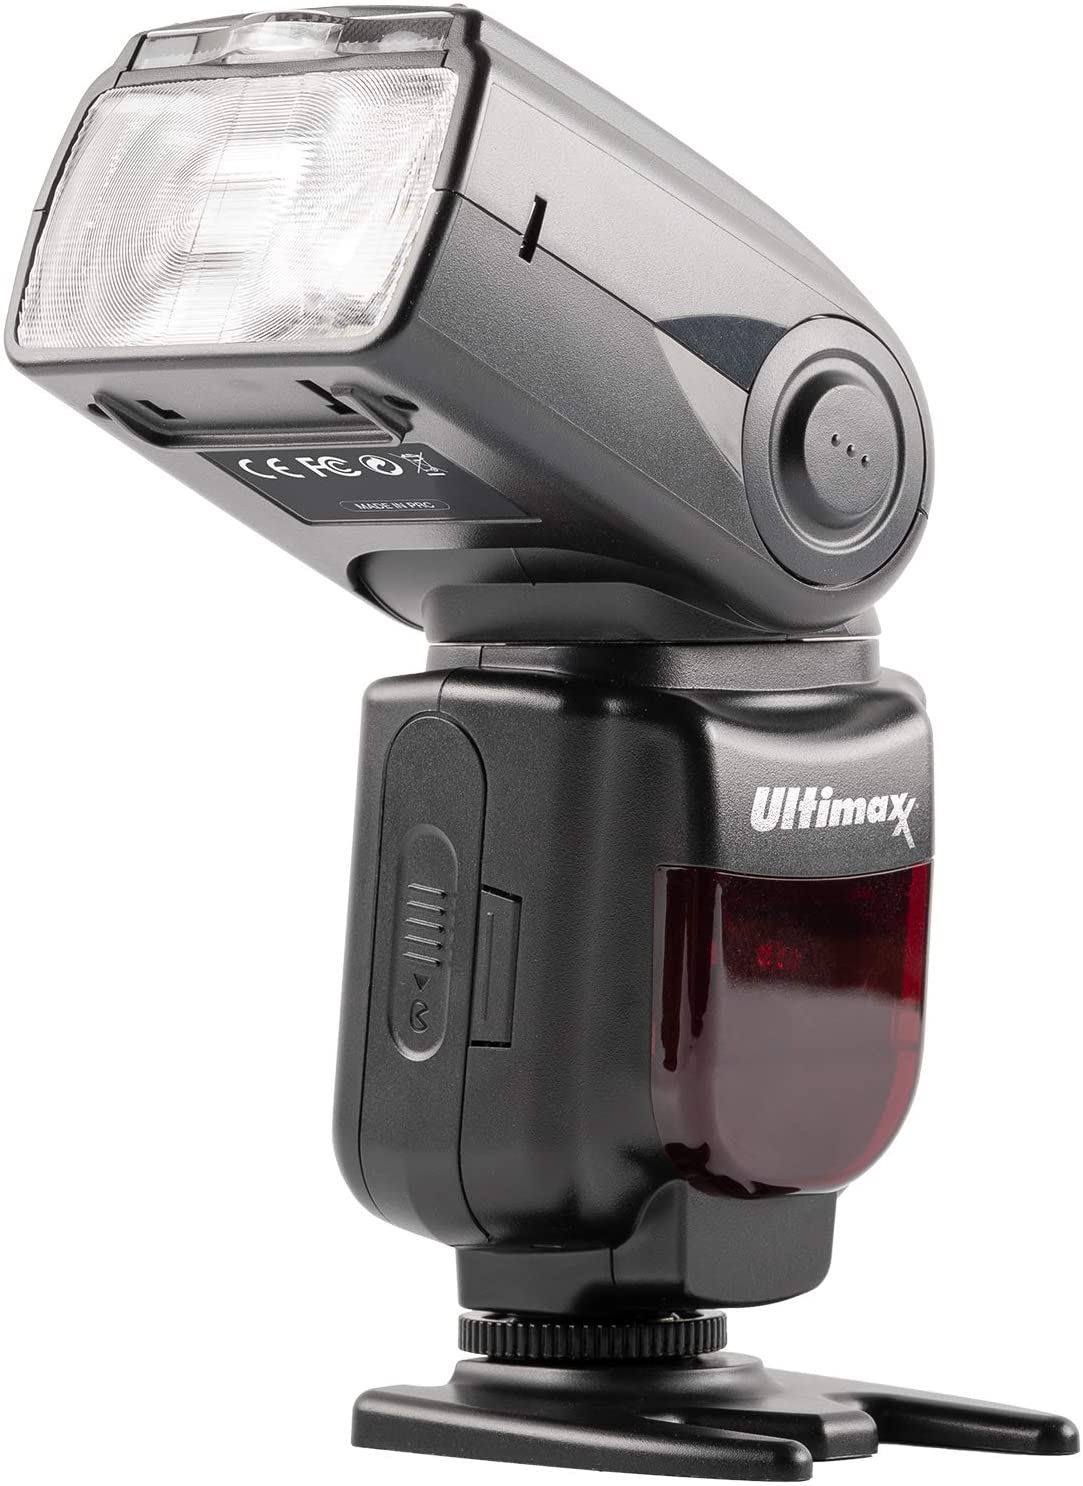 Ultimaxx TTL Dedicated Flash w